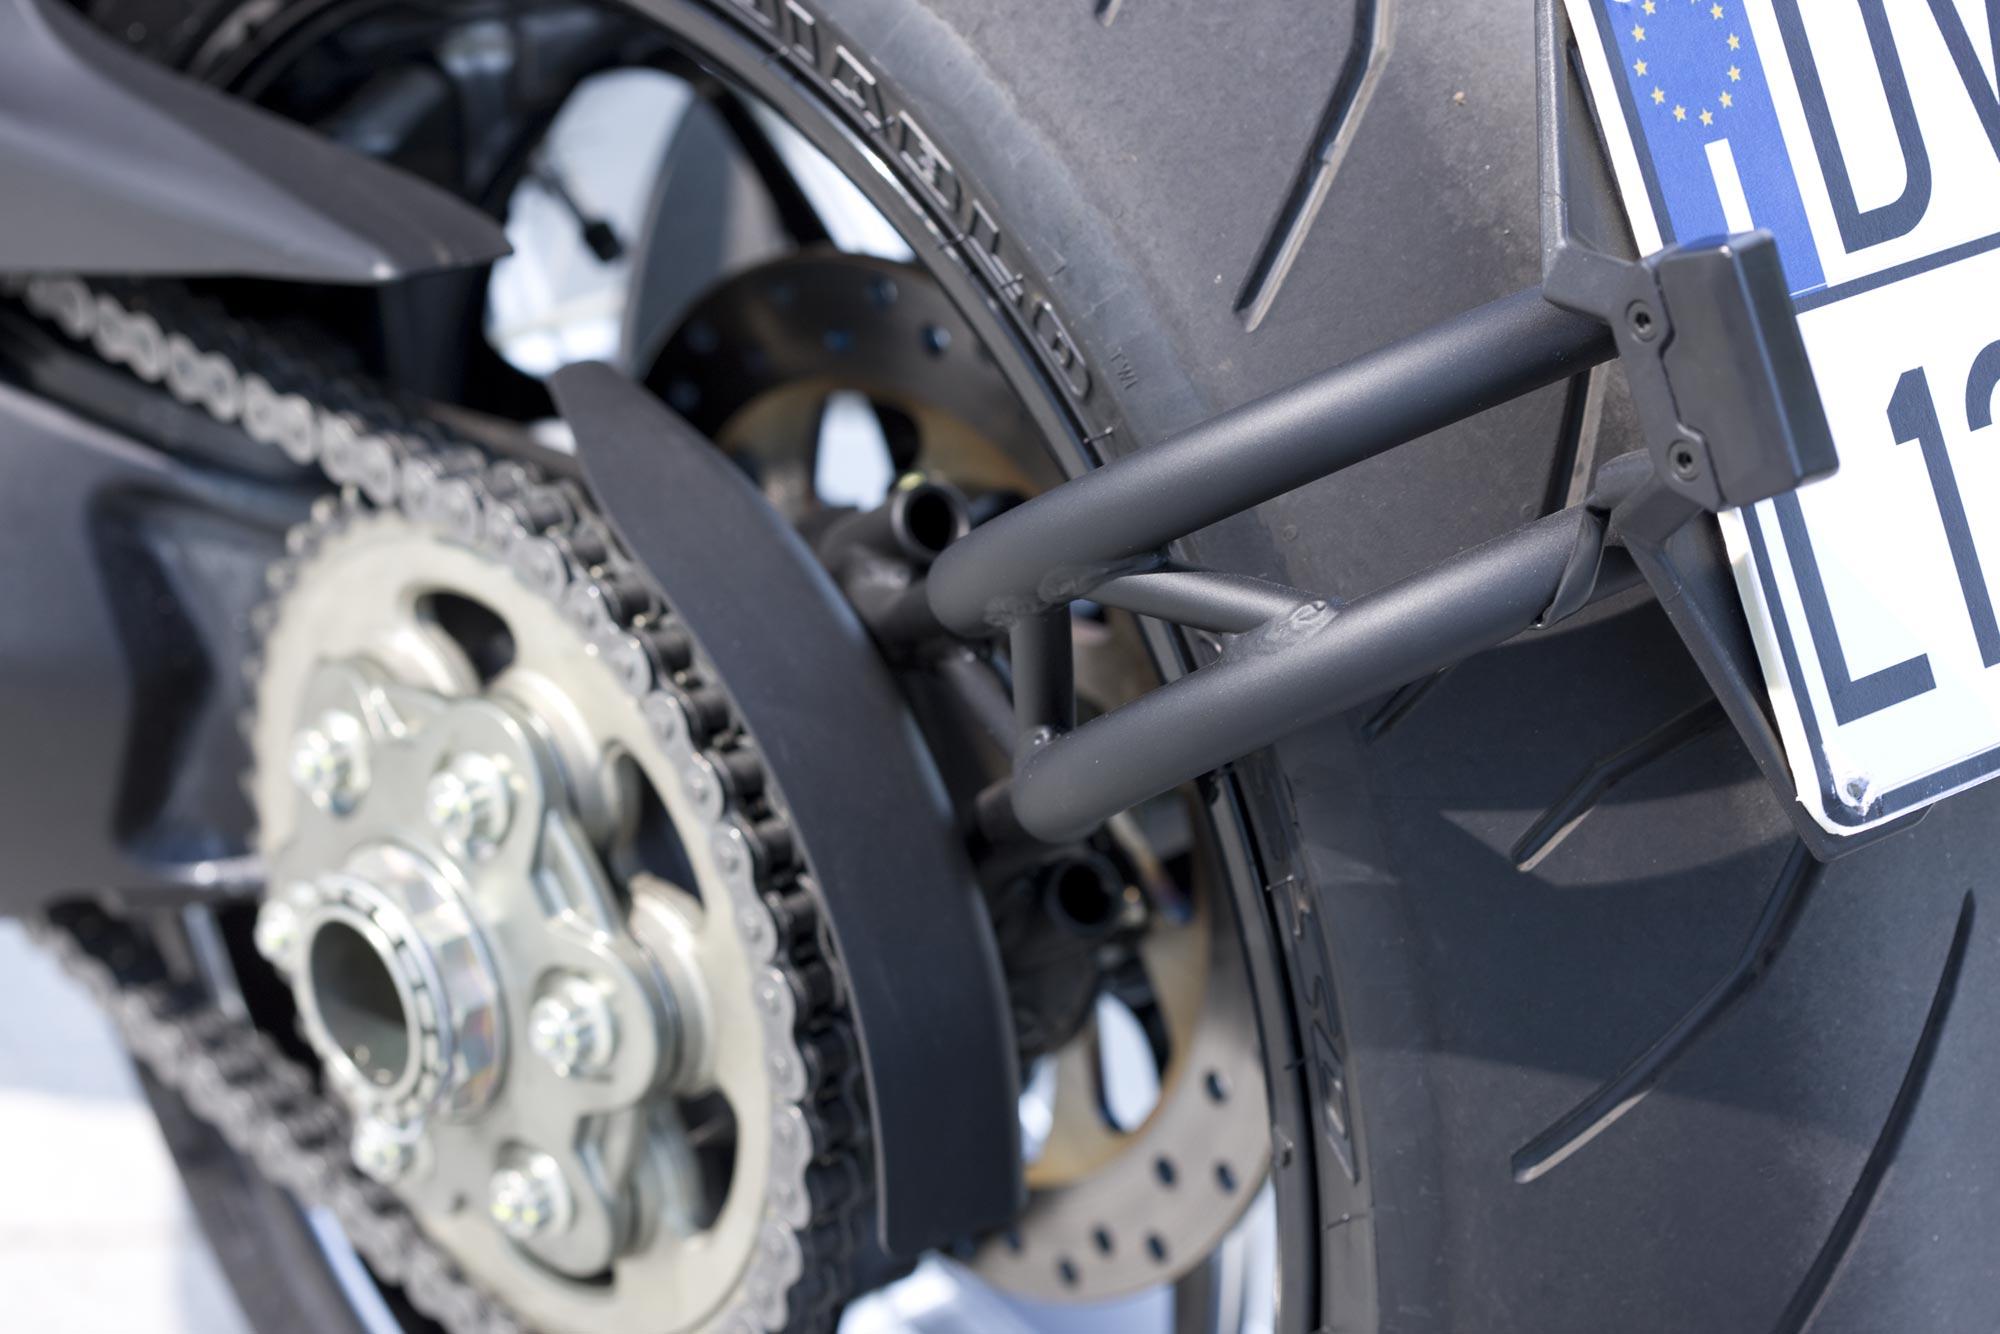 recall ducati diavel asphalt rubber - Motorcycle Licence Plate Frame